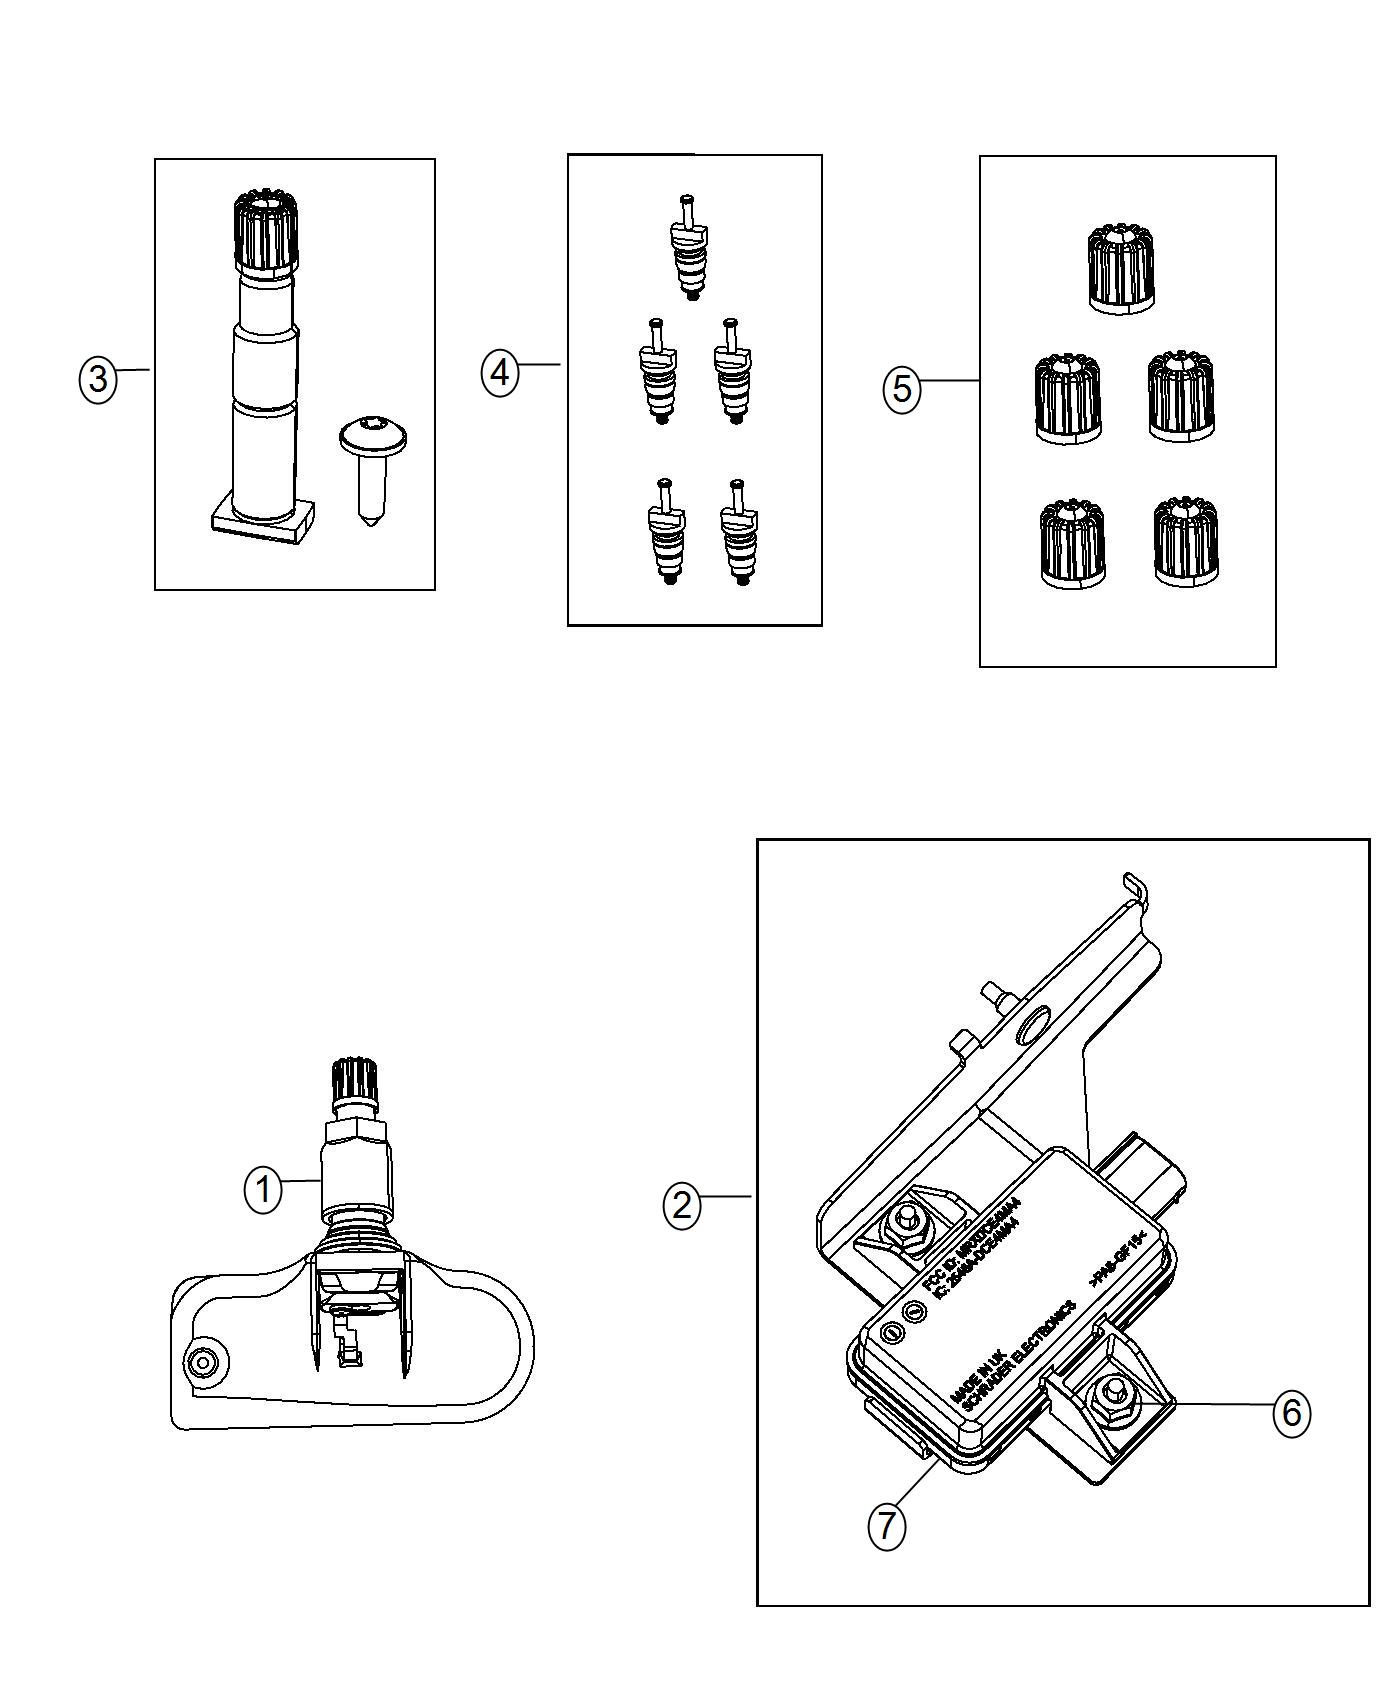 2014 Ram C V Tradesman Camshaft: Ram C/V TRADESMAN Module. Tire Pressure Monitoring. [xgm